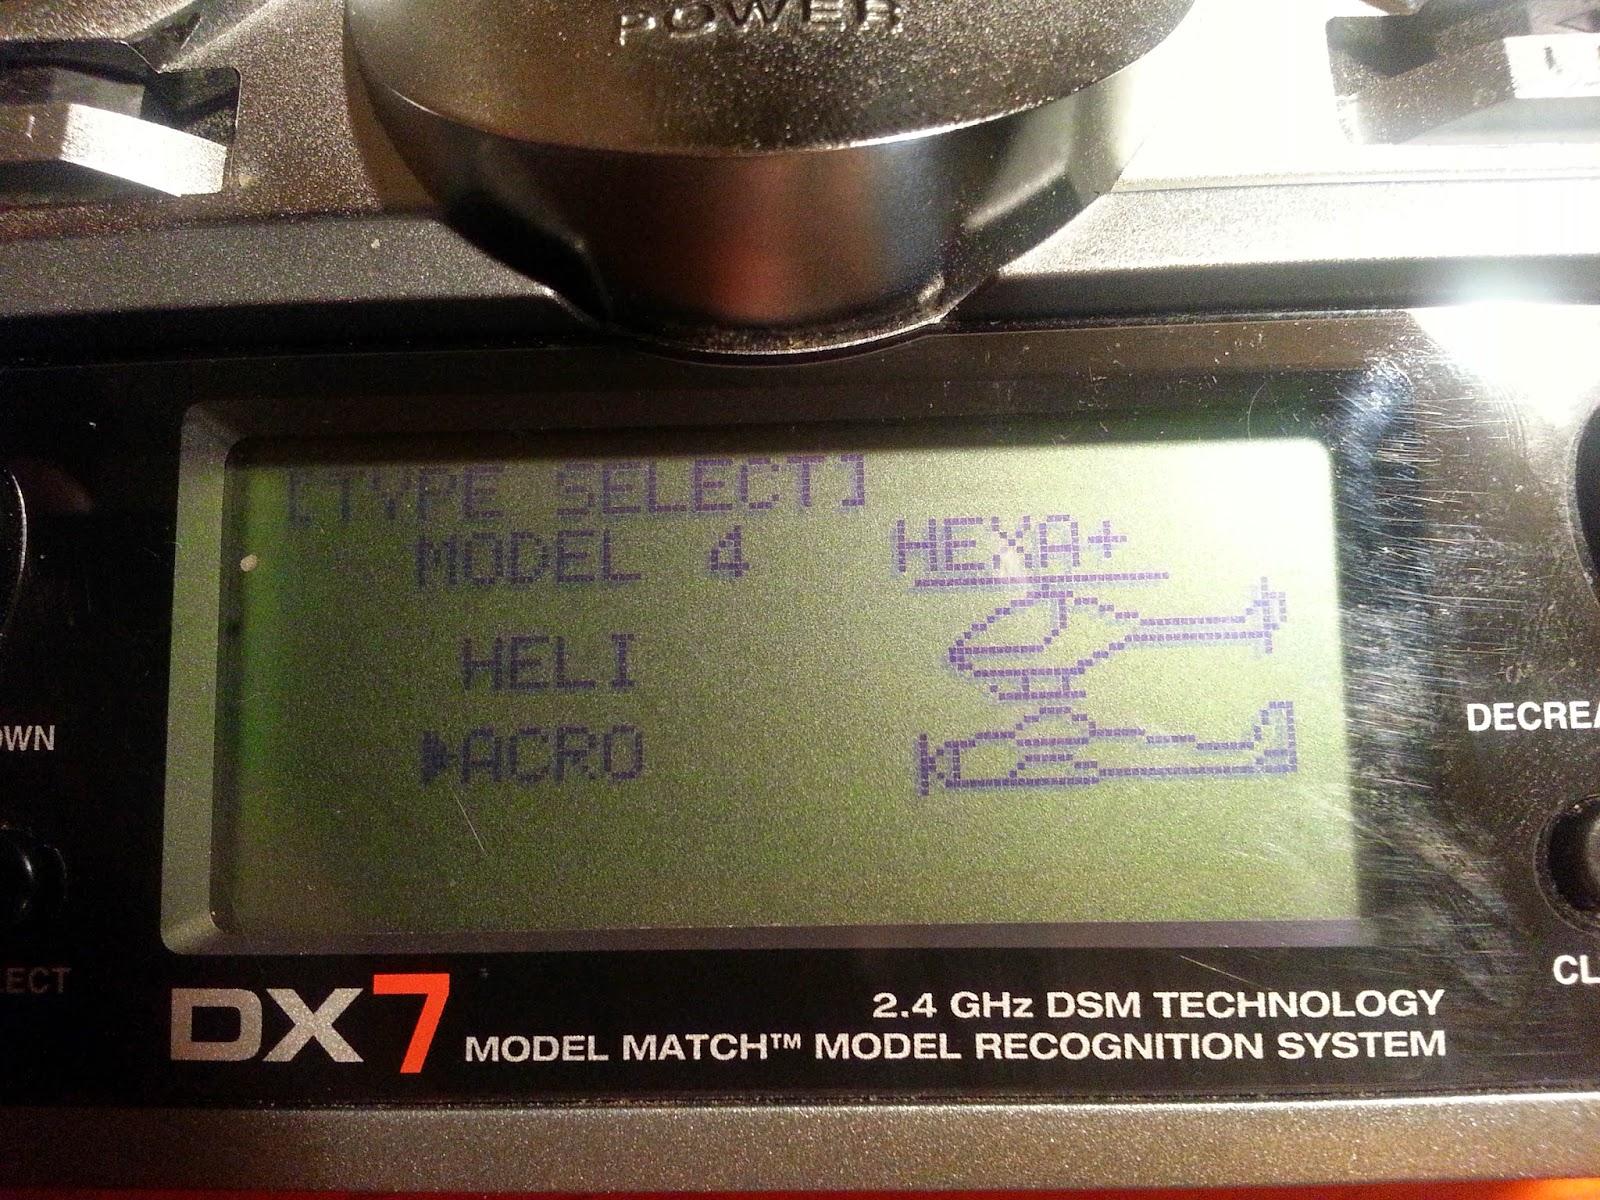 DX7 Settings - Photo | DJI F550 Hexacopter Naza V2 GPS, AR8000, DX7